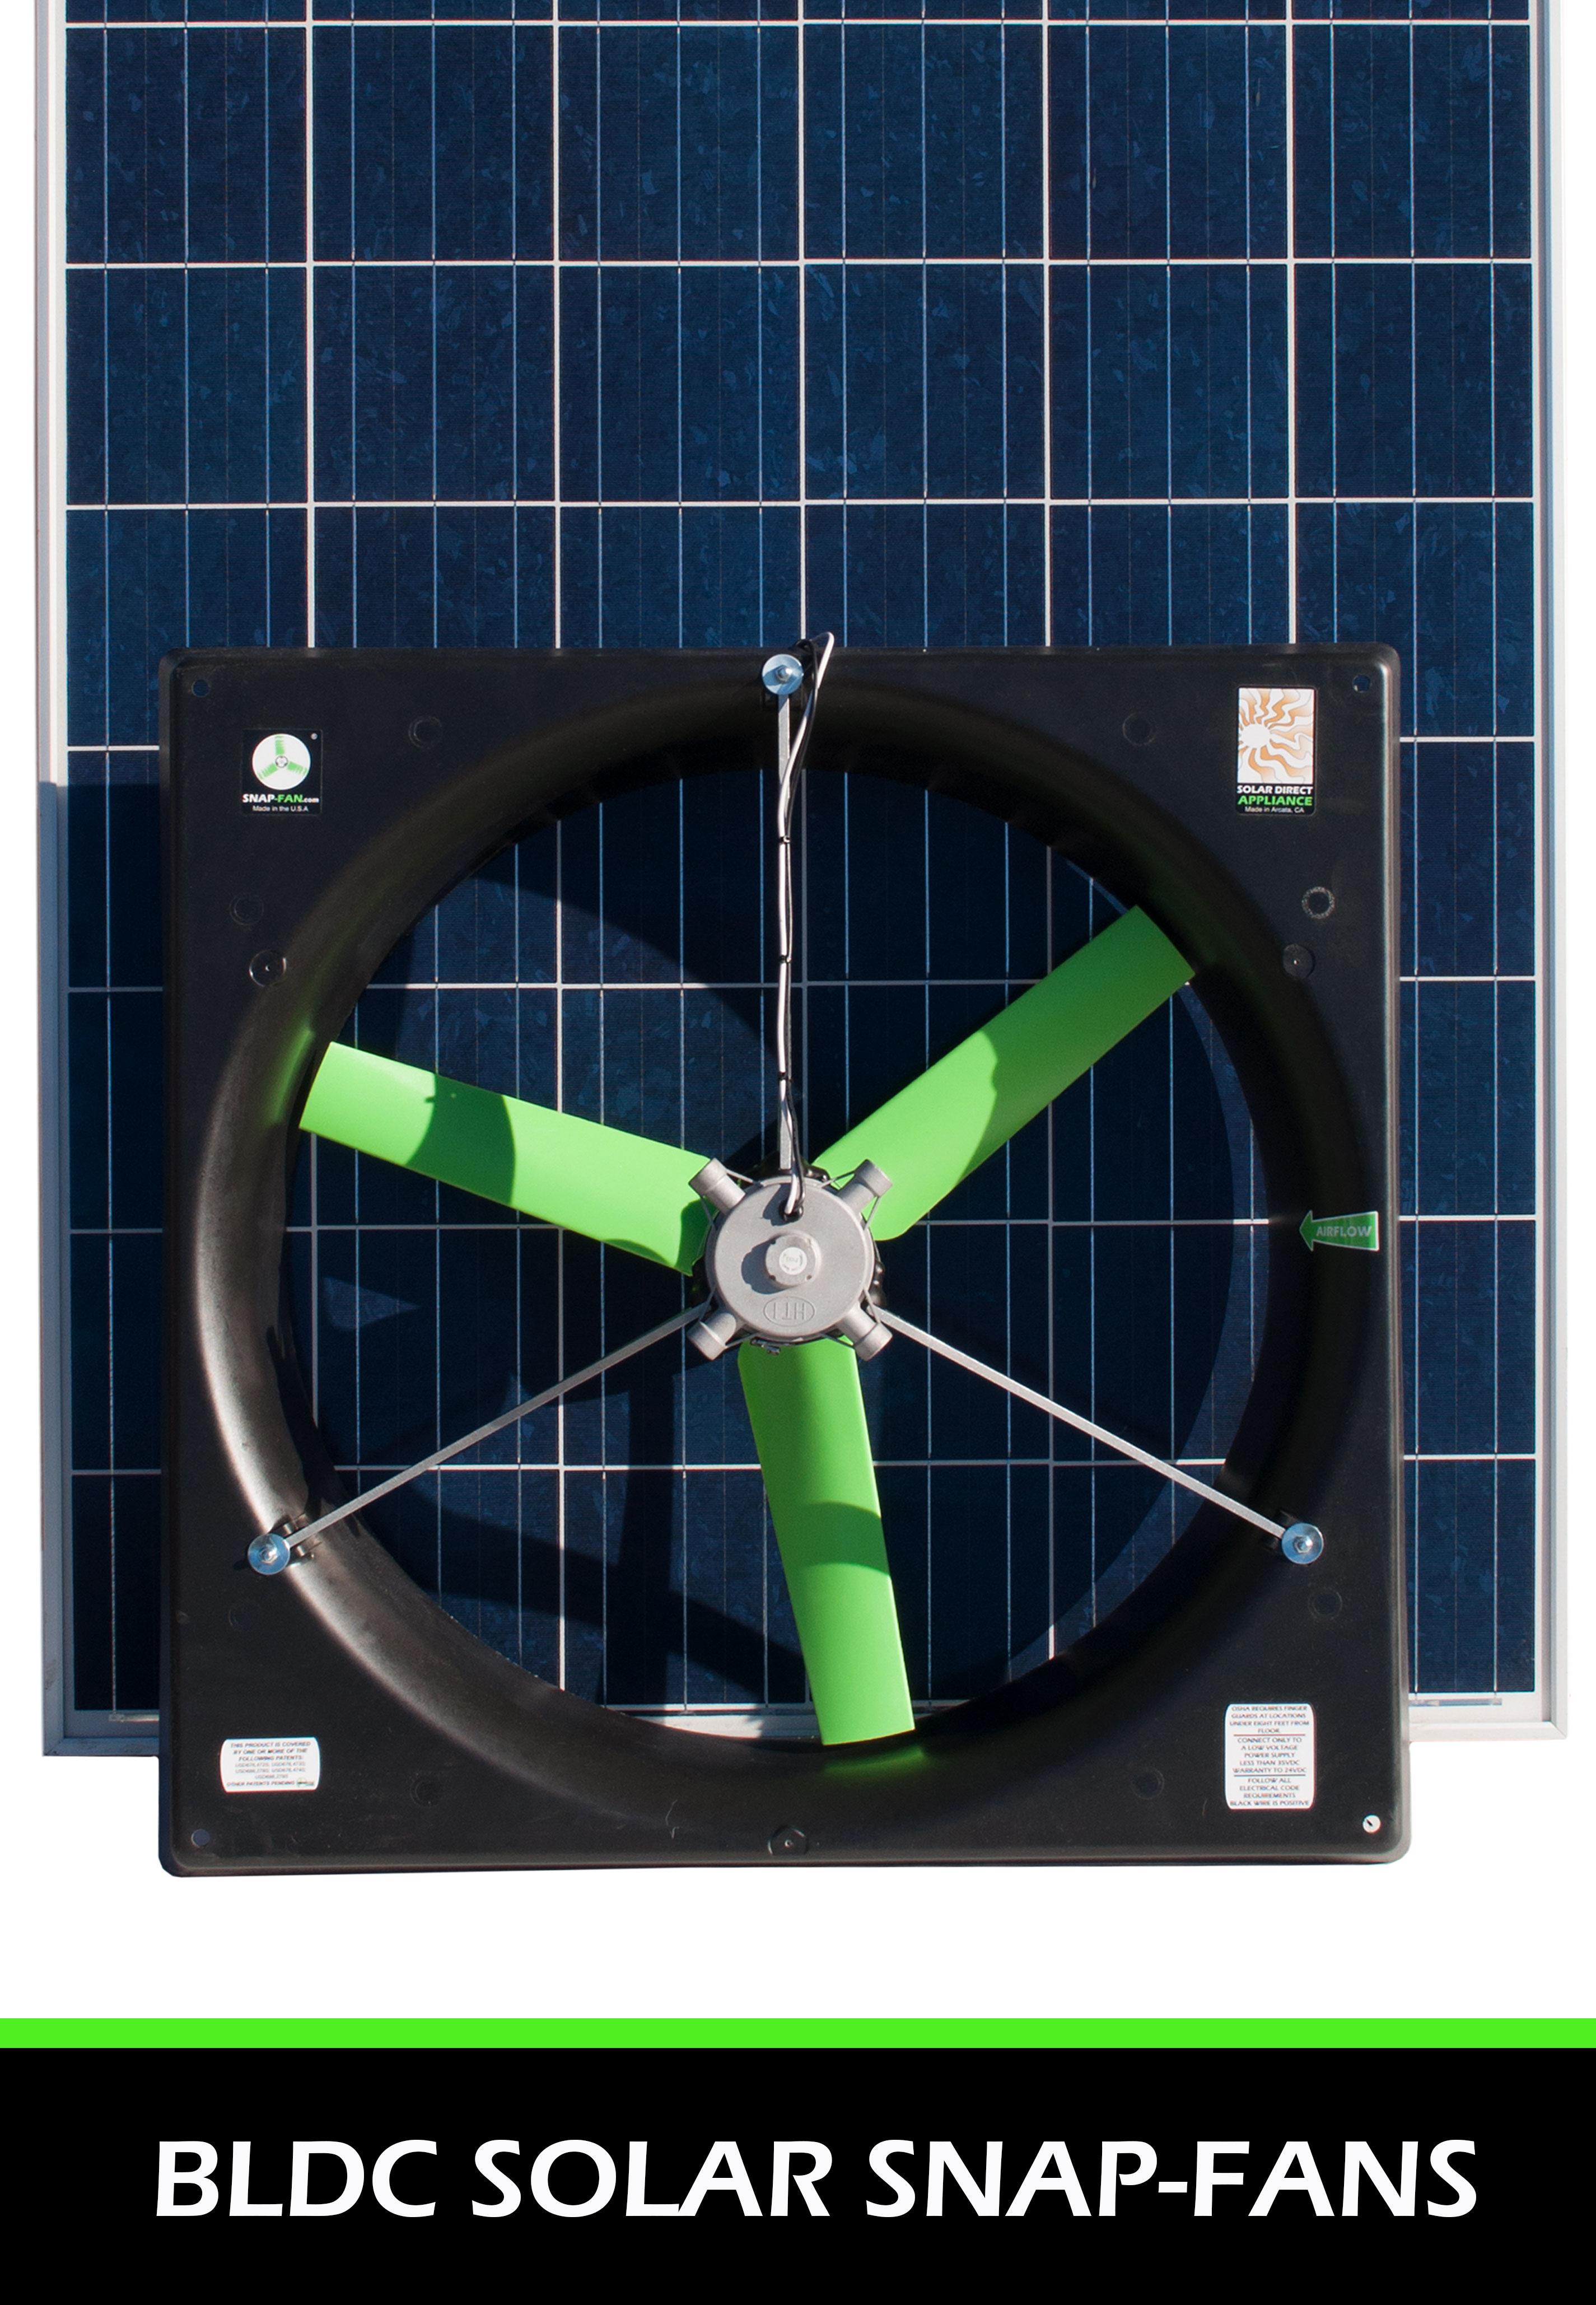 Solar Brushless DC ventilation fans